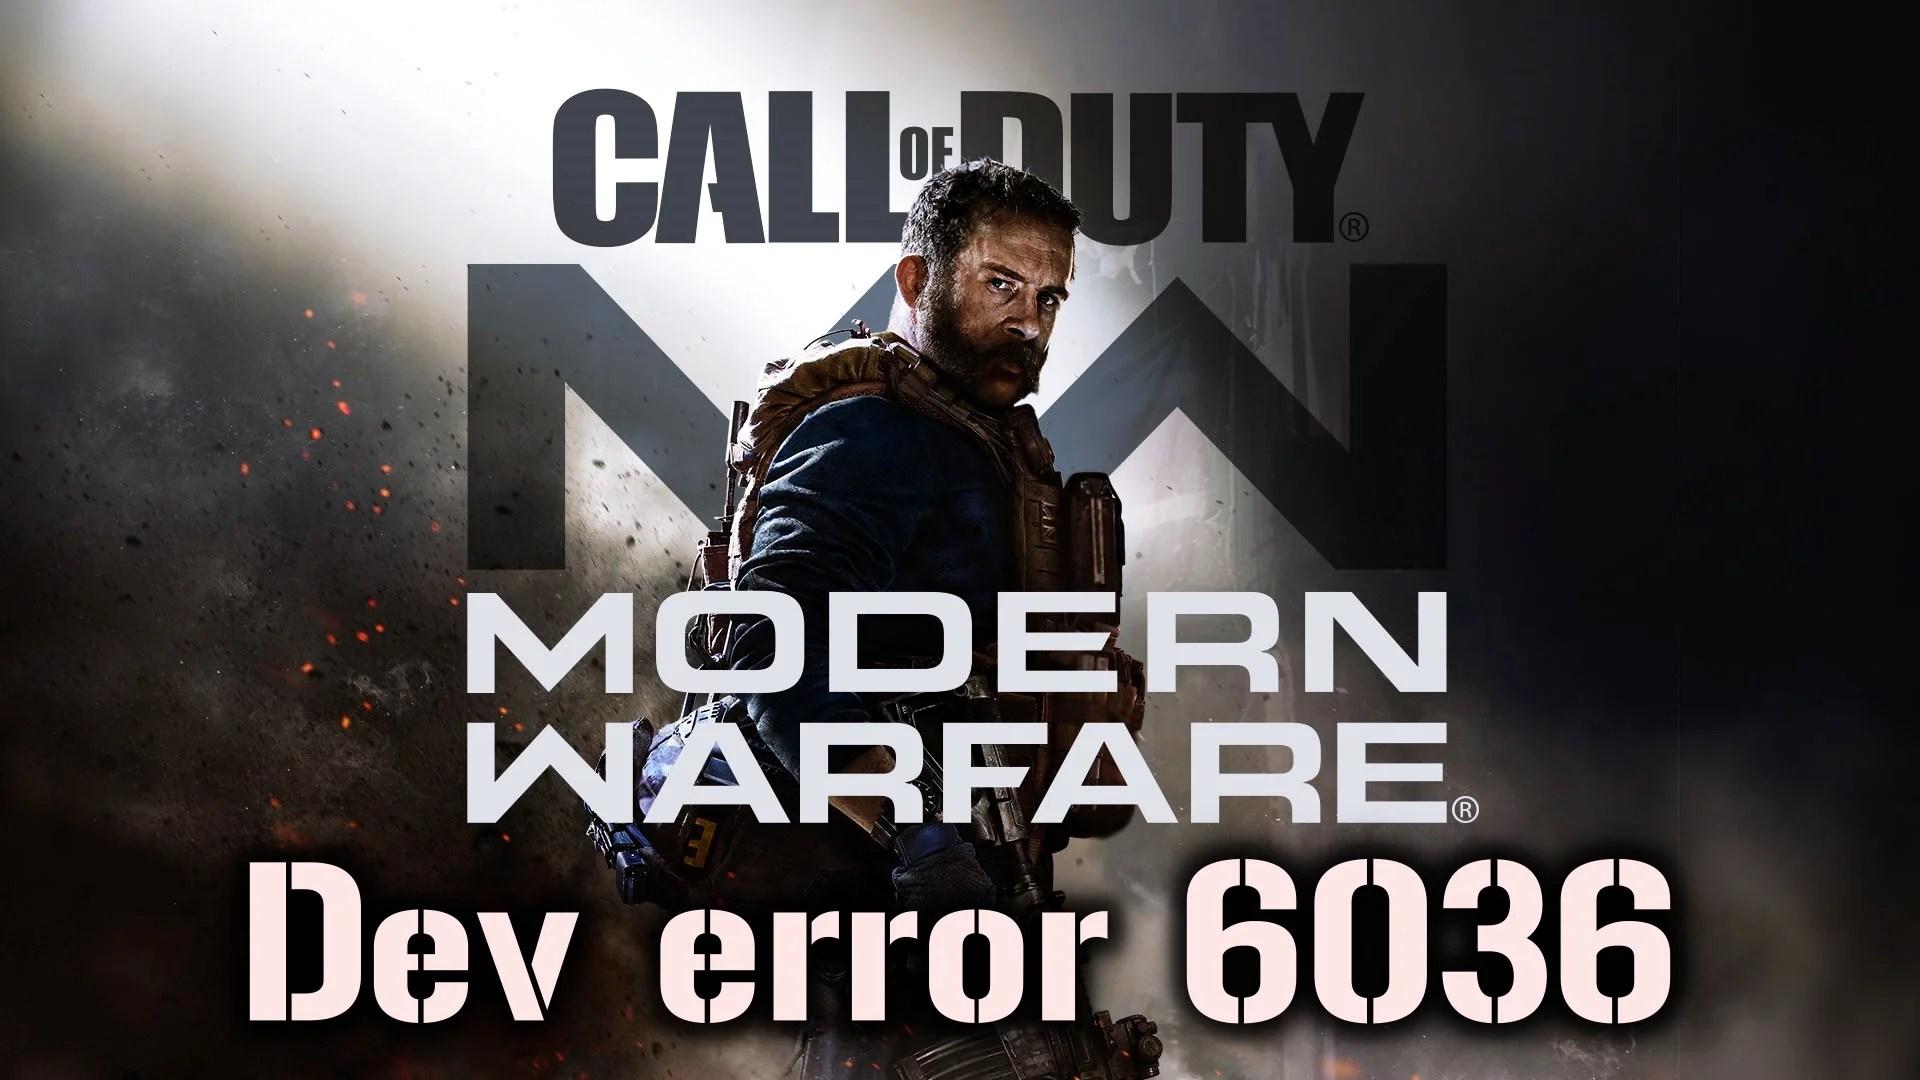 【News】『CoD:MW』で発生するエラー「dev error 6036」の対処法